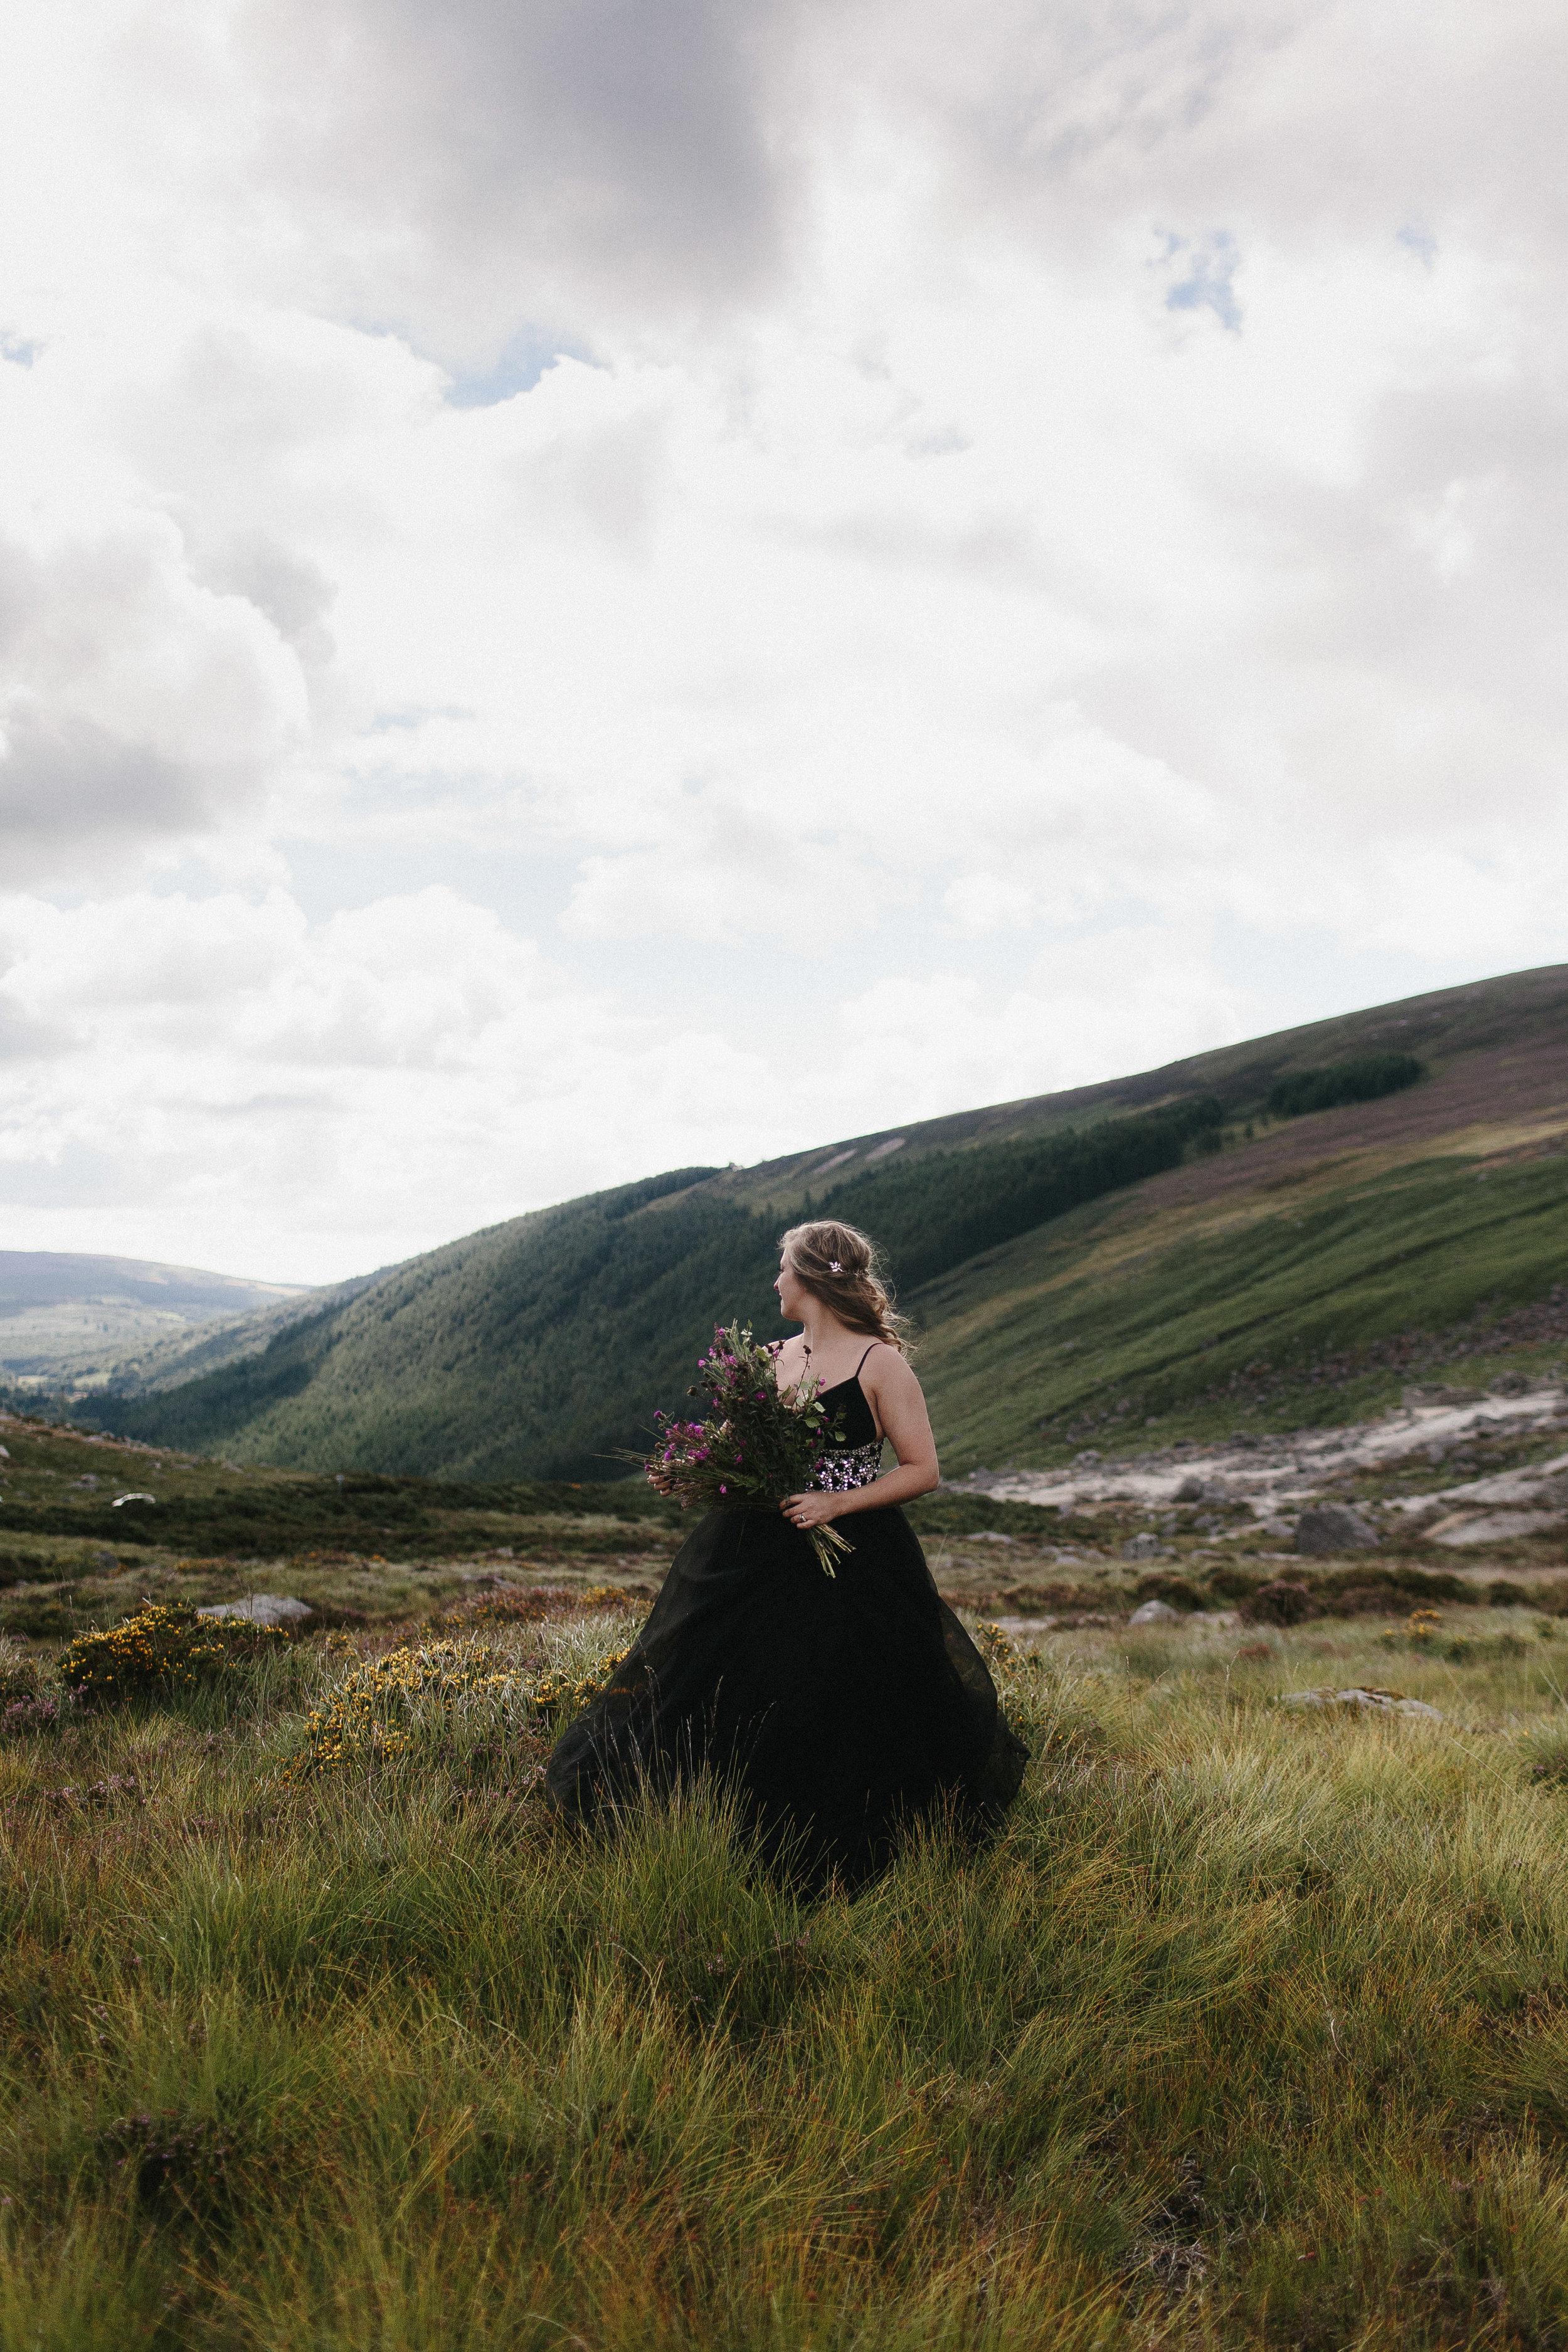 ireland_elopement_black_wedding_dress_wicklow_glendalough_athy_st_kevins_way_1293.jpg